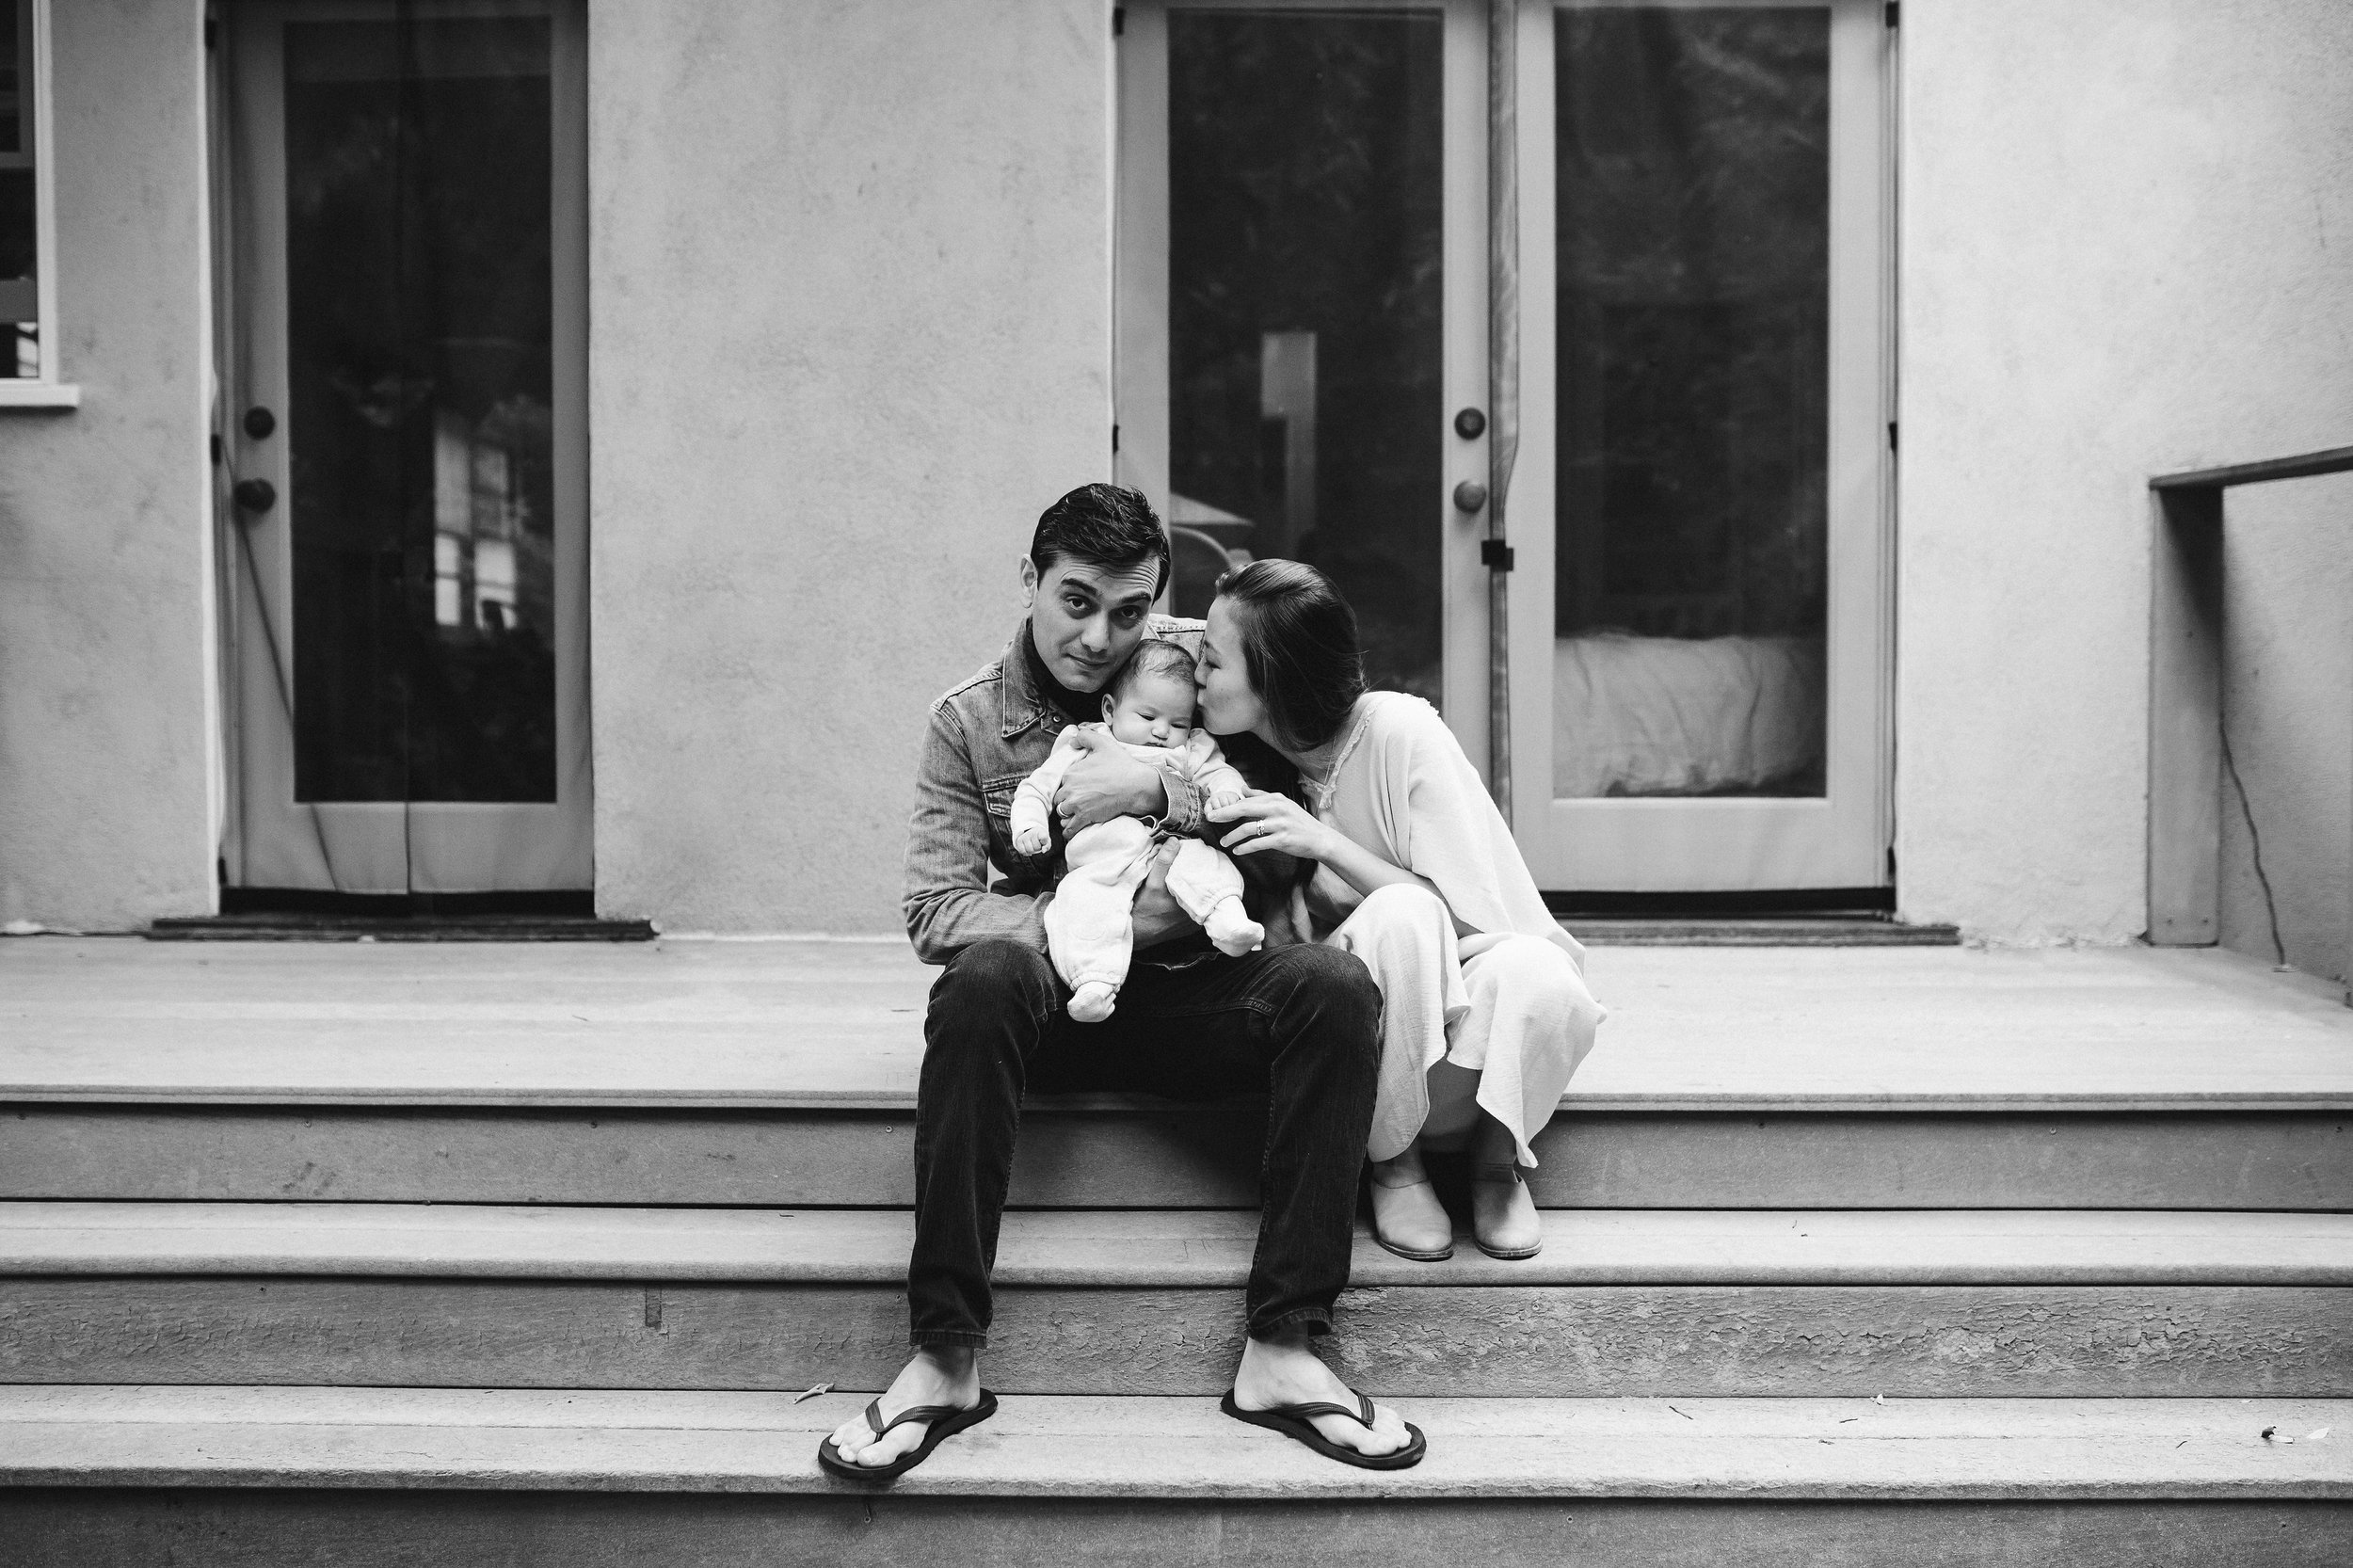 mehana-family-session_la-los-angeles-family-photographer-18-2.jpg